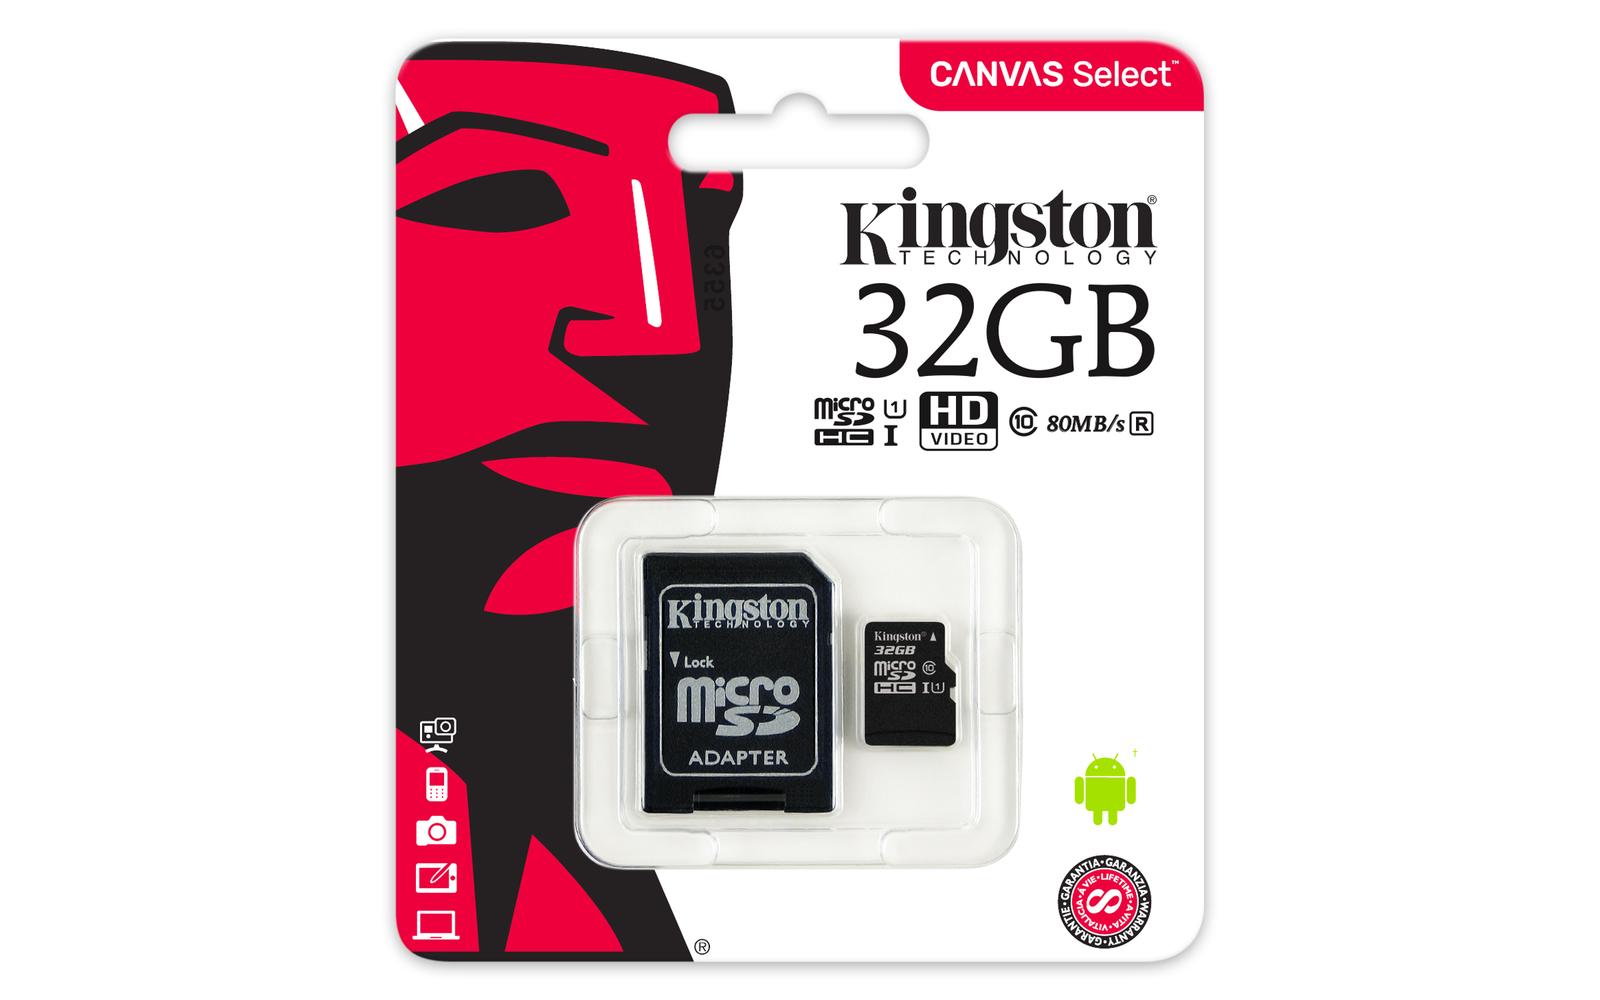 32GB Kingston Canvas Select MicroSDHC Card + SD Adaptor - Class 10 UHS-I image